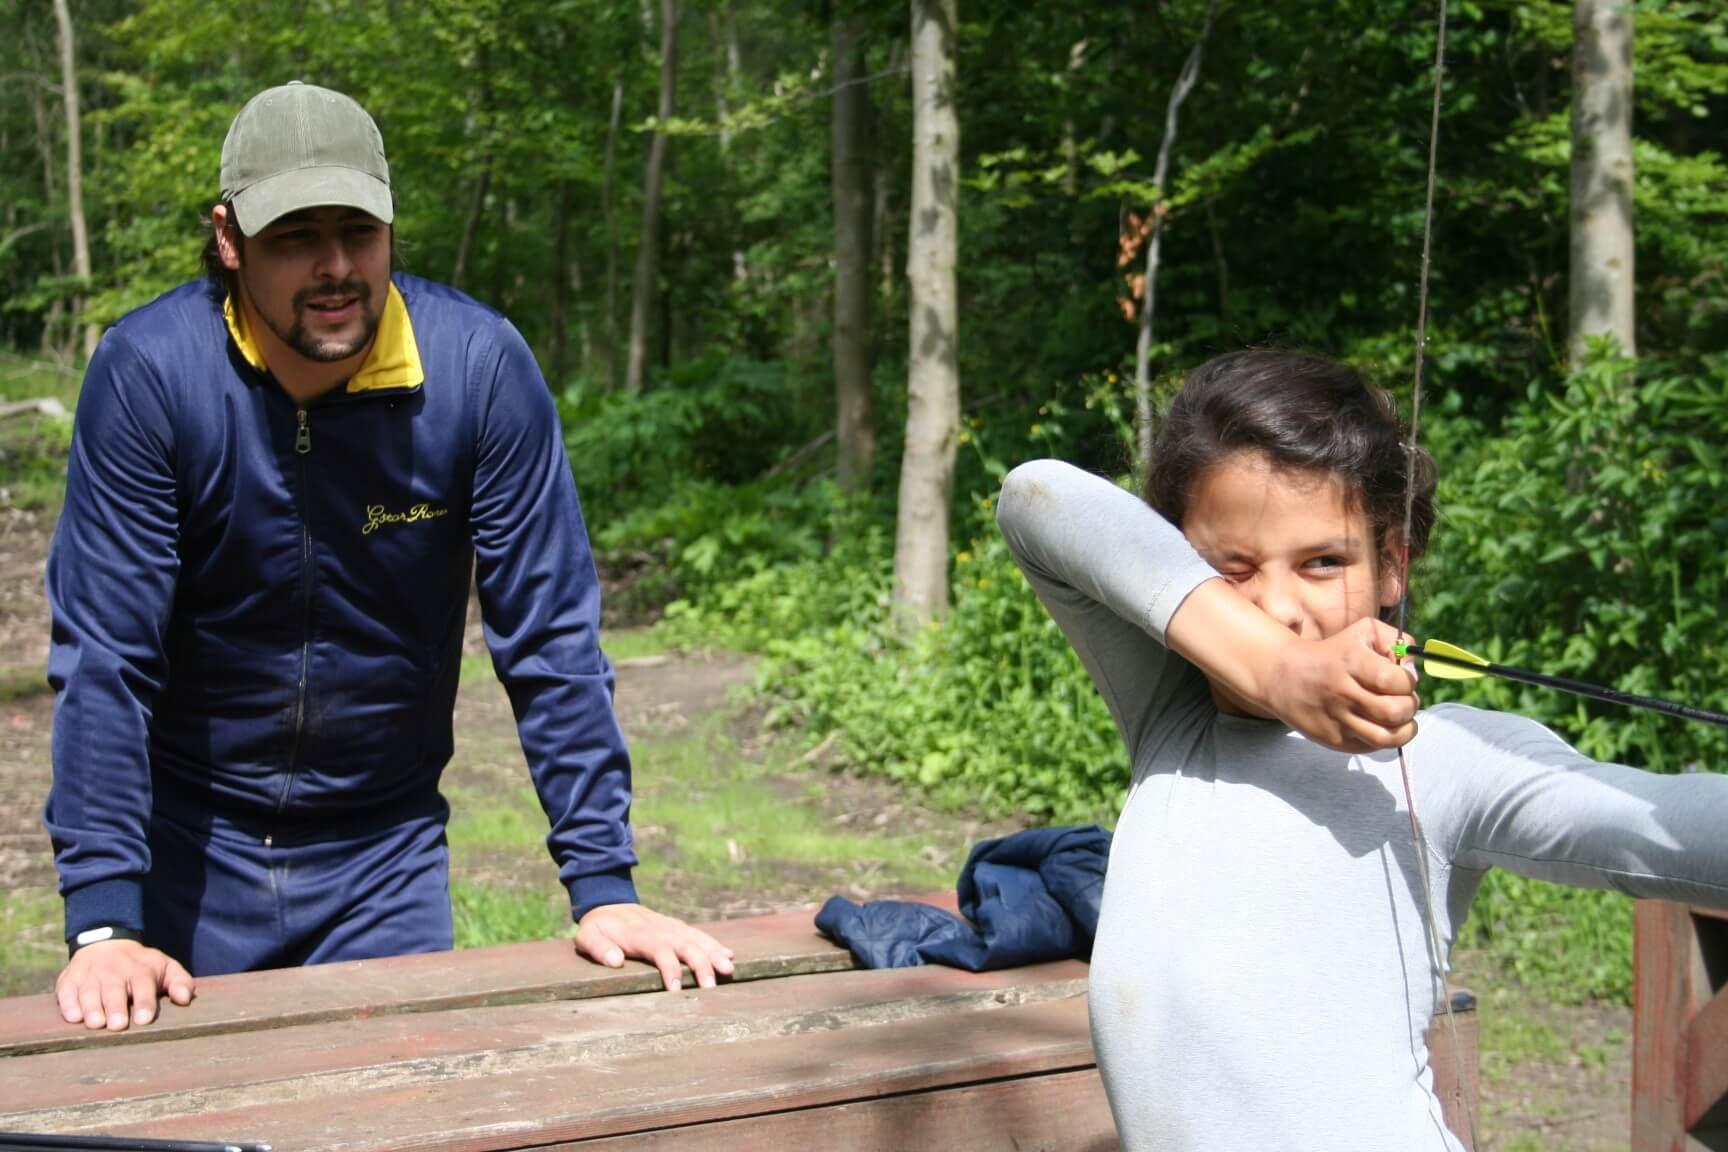 Boogschieten-survival-gezin-Almere-noresize